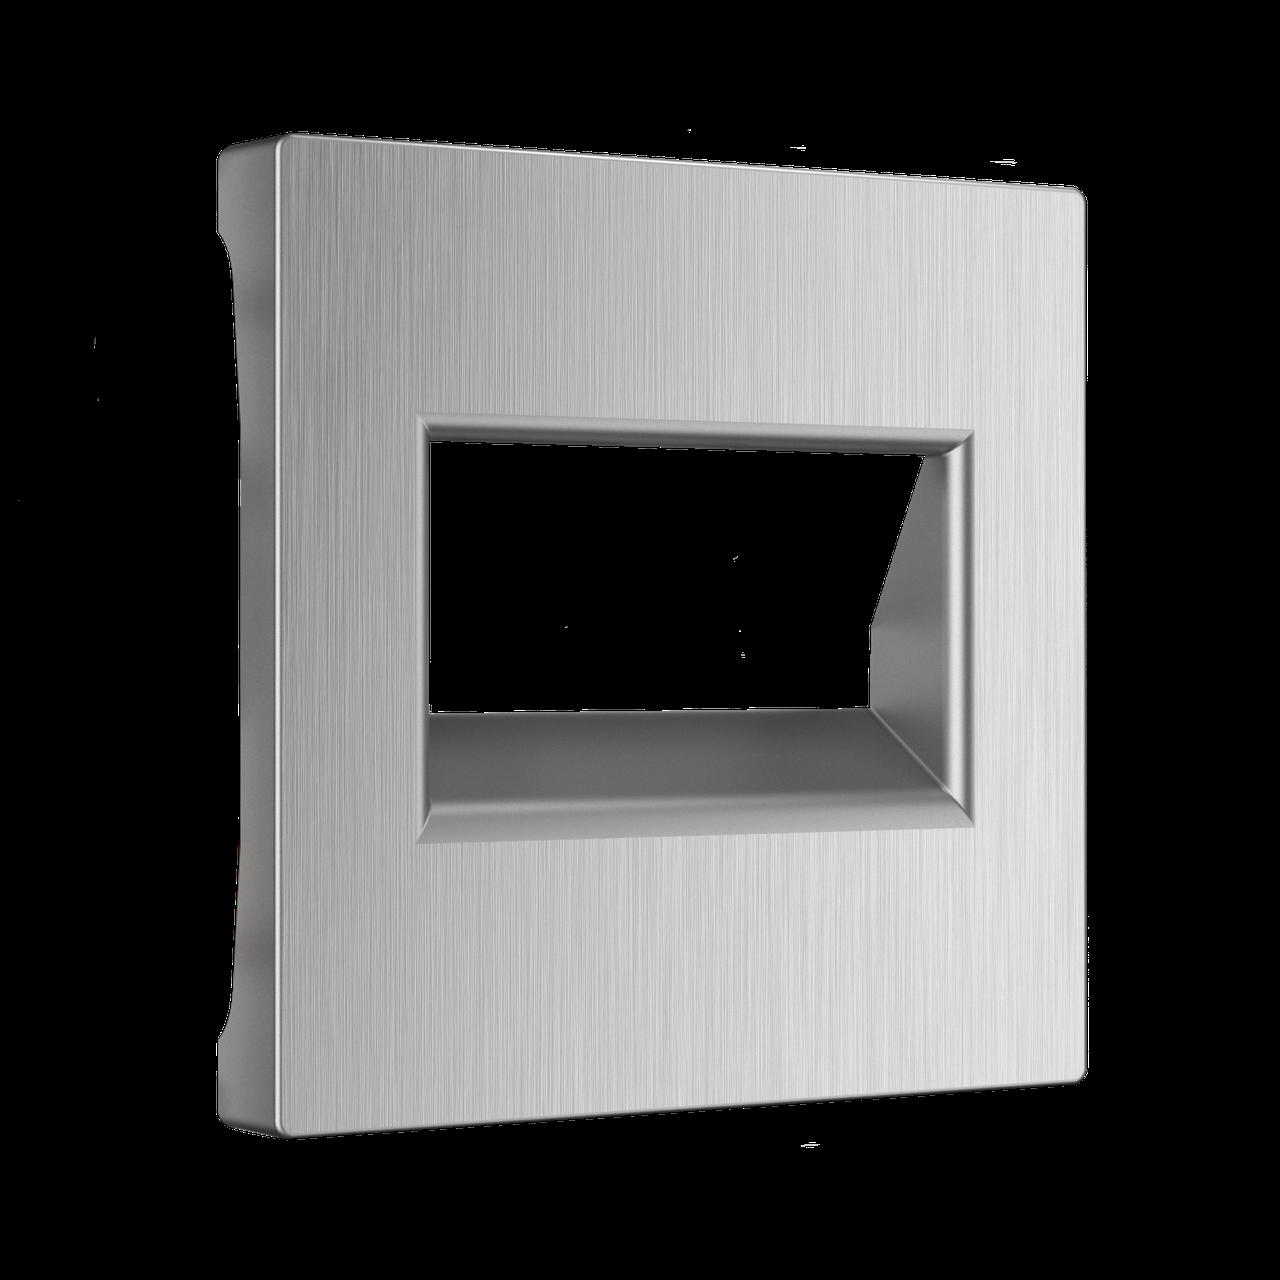 Розетка Ethernet RJ-45 /WL09-RJ-45 (серебряный рифленый)